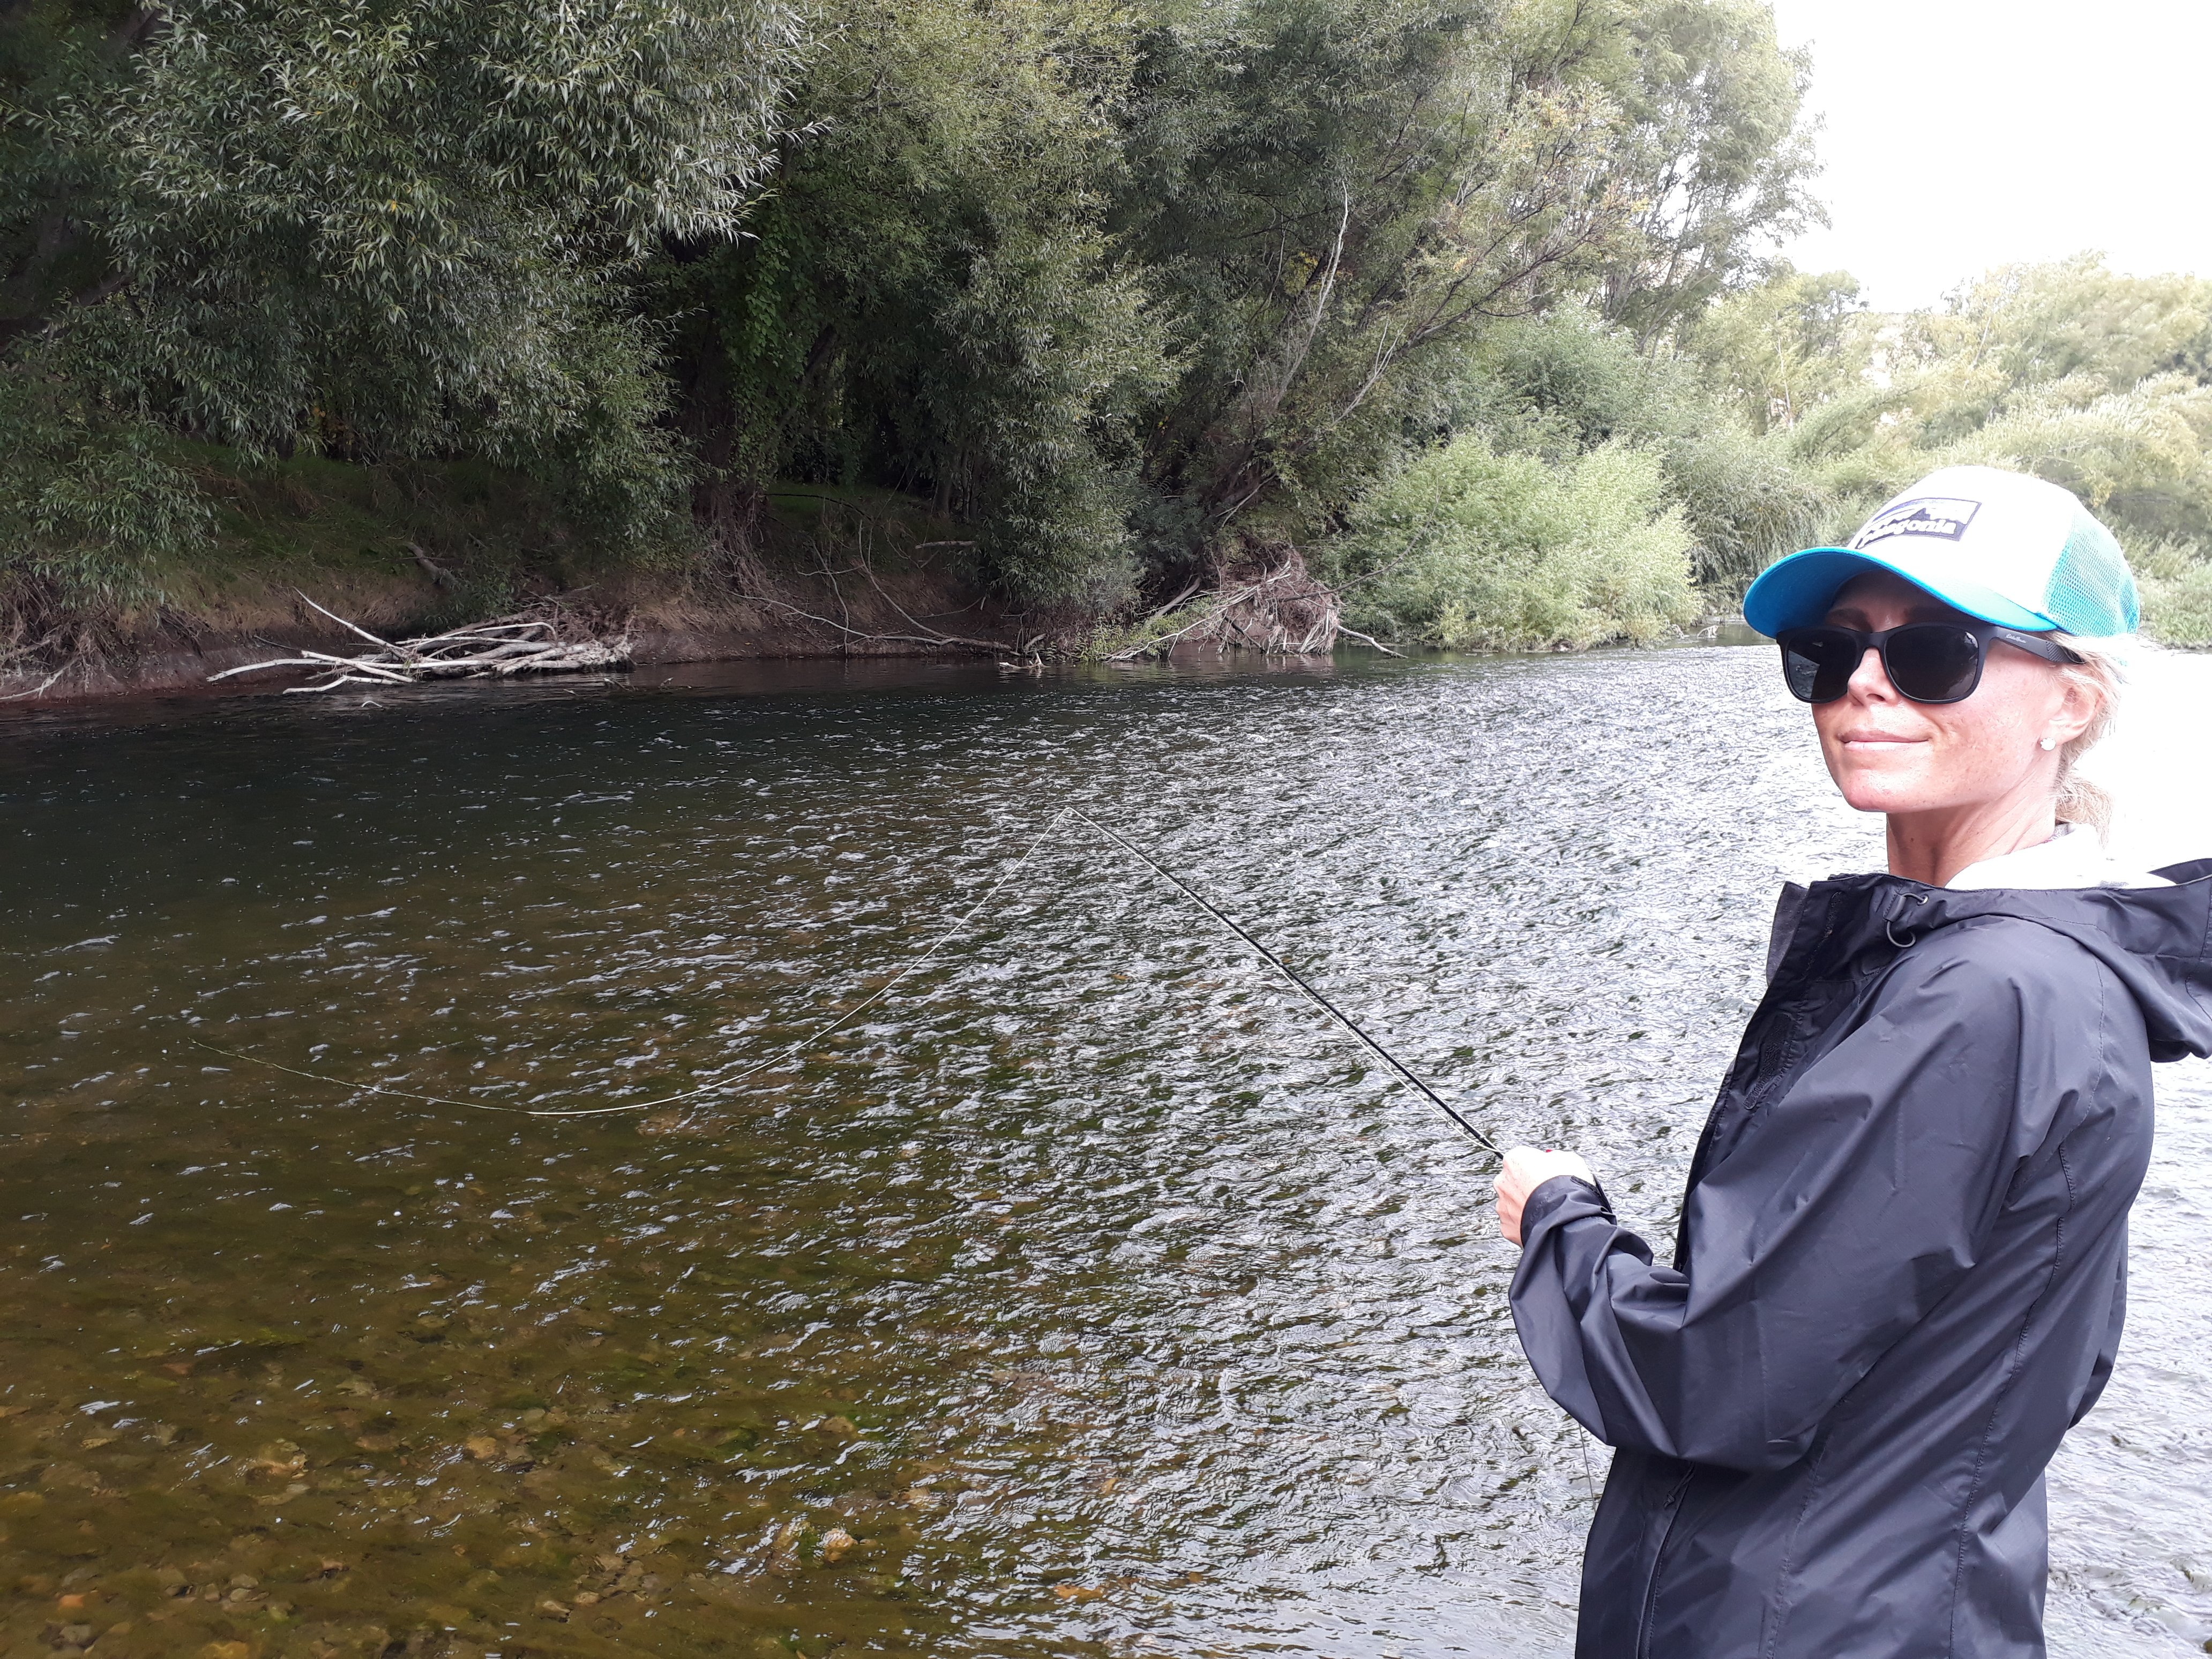 Brigitte's New Zealand fly fishing experience on the Tukituki river, Hawkes Bay